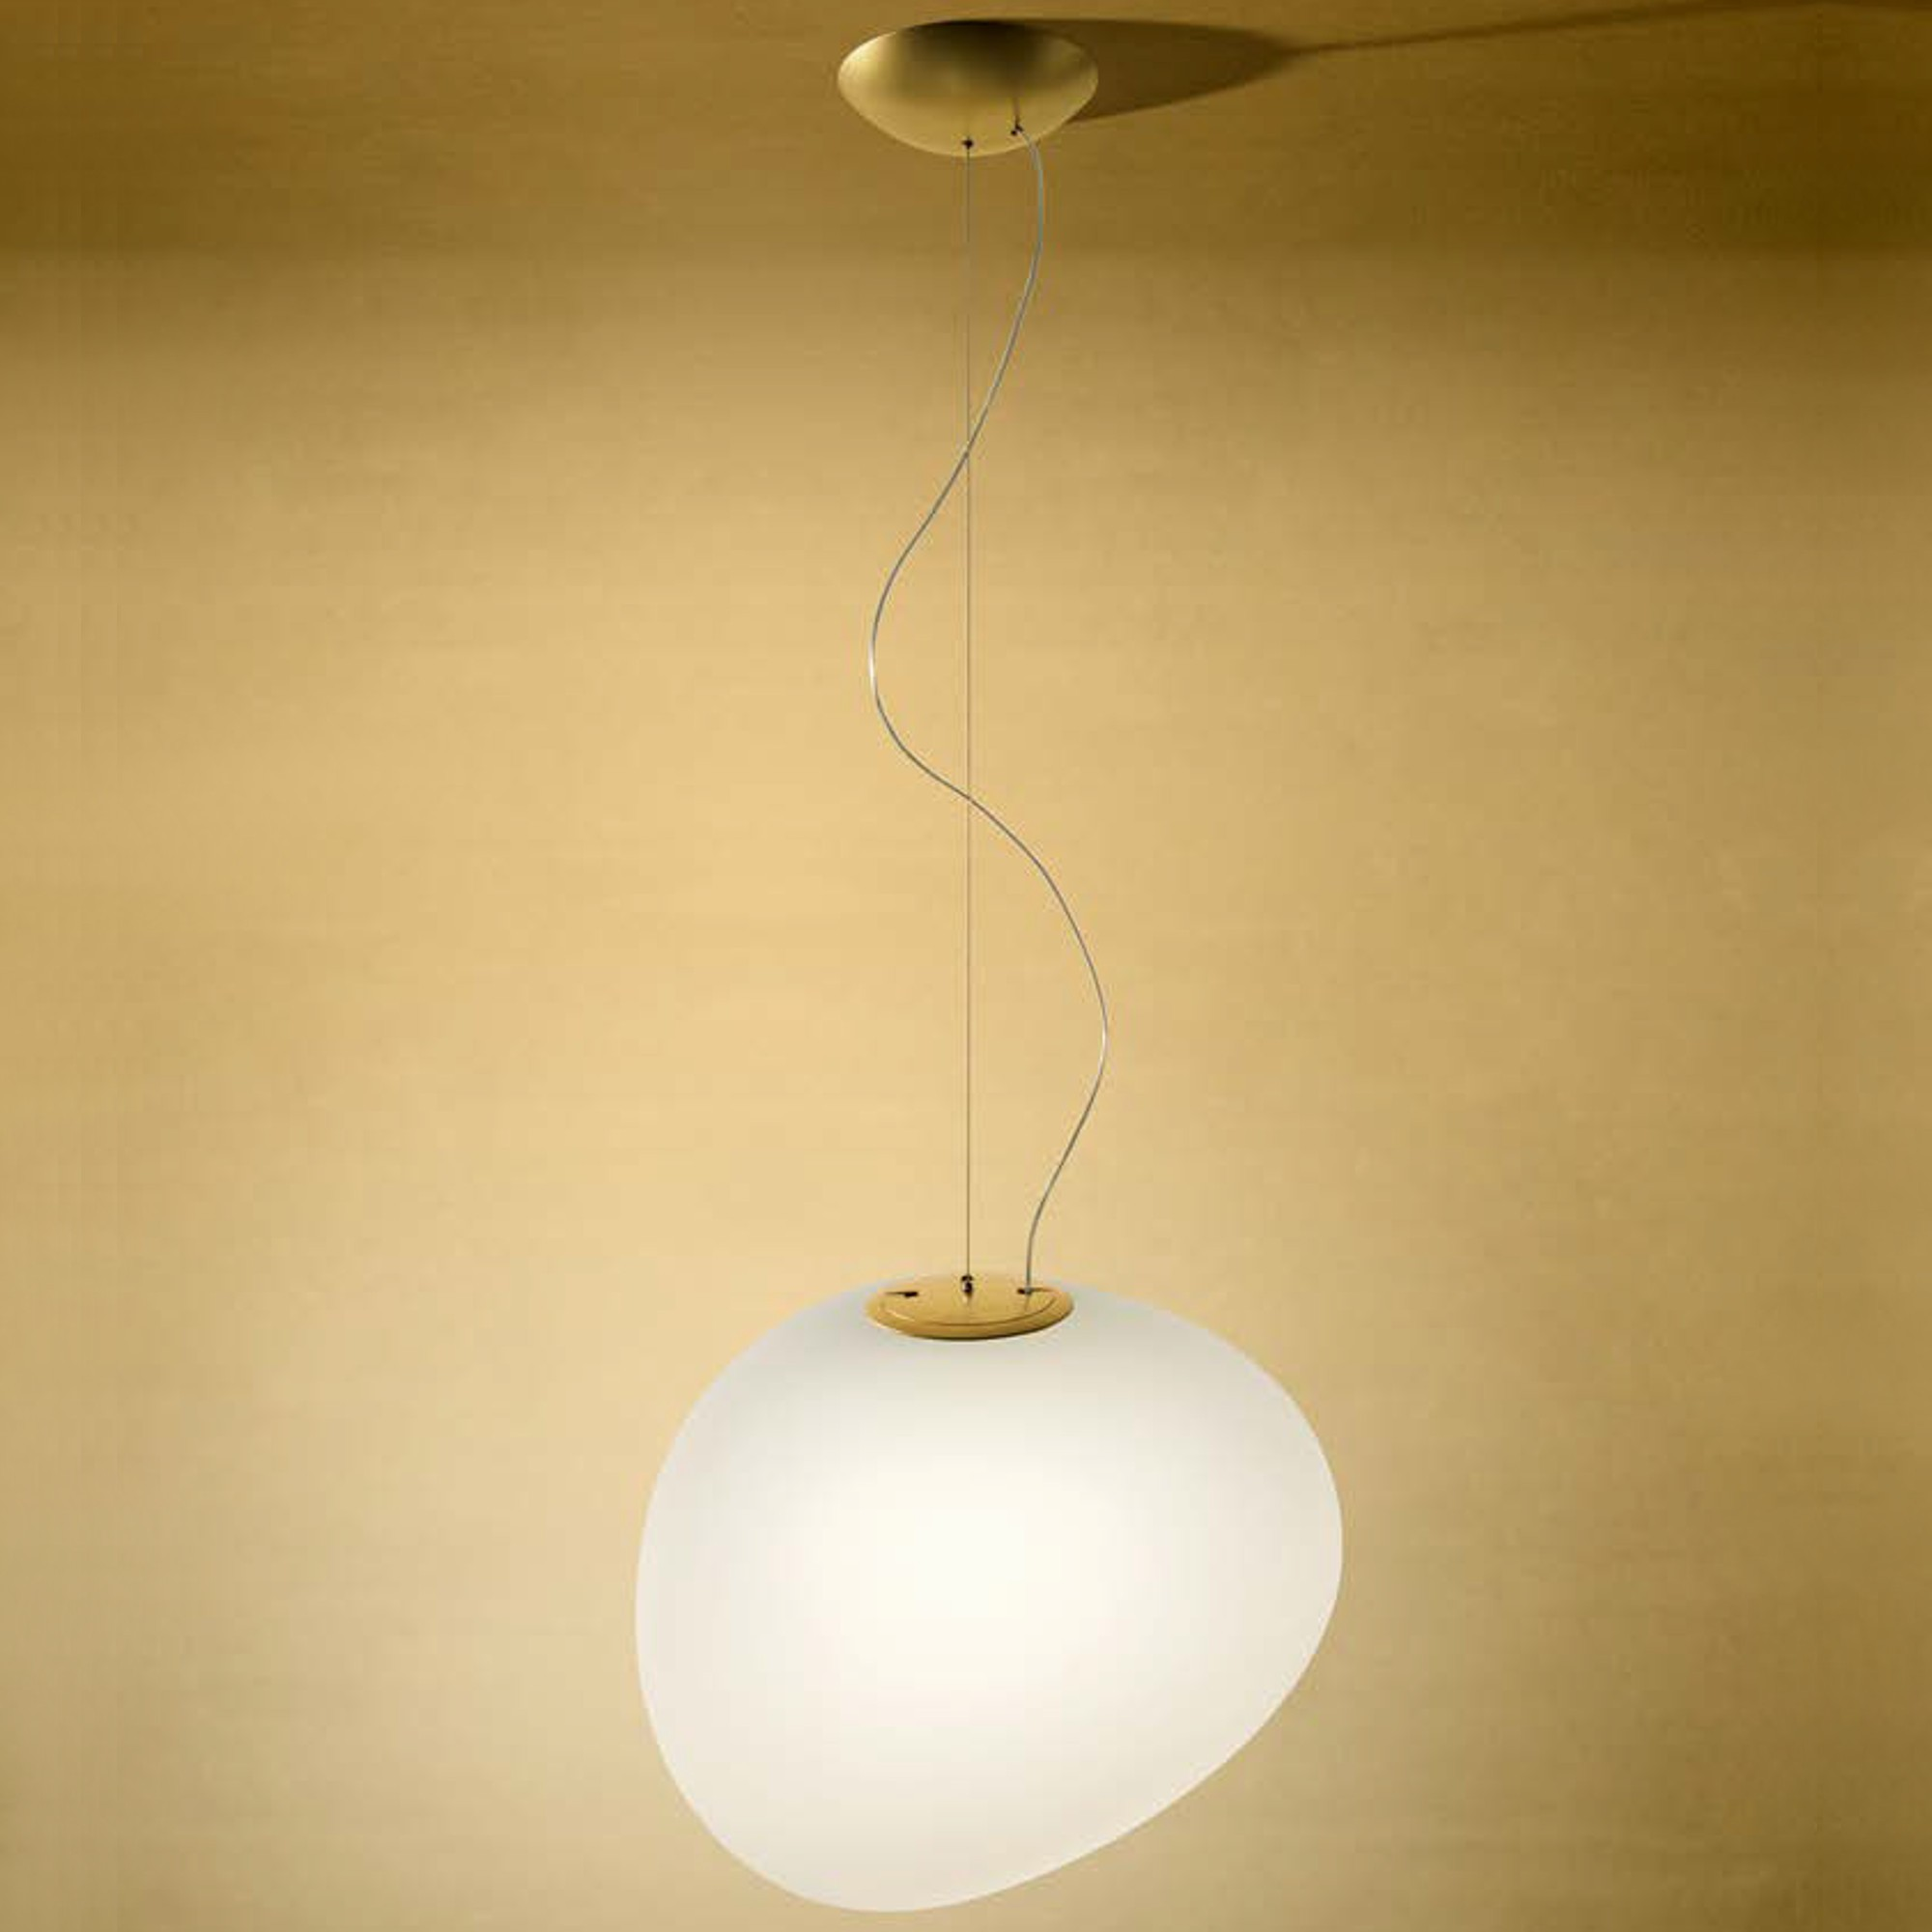 GREGG SUSPENSION LAMP, by FOSCARINI